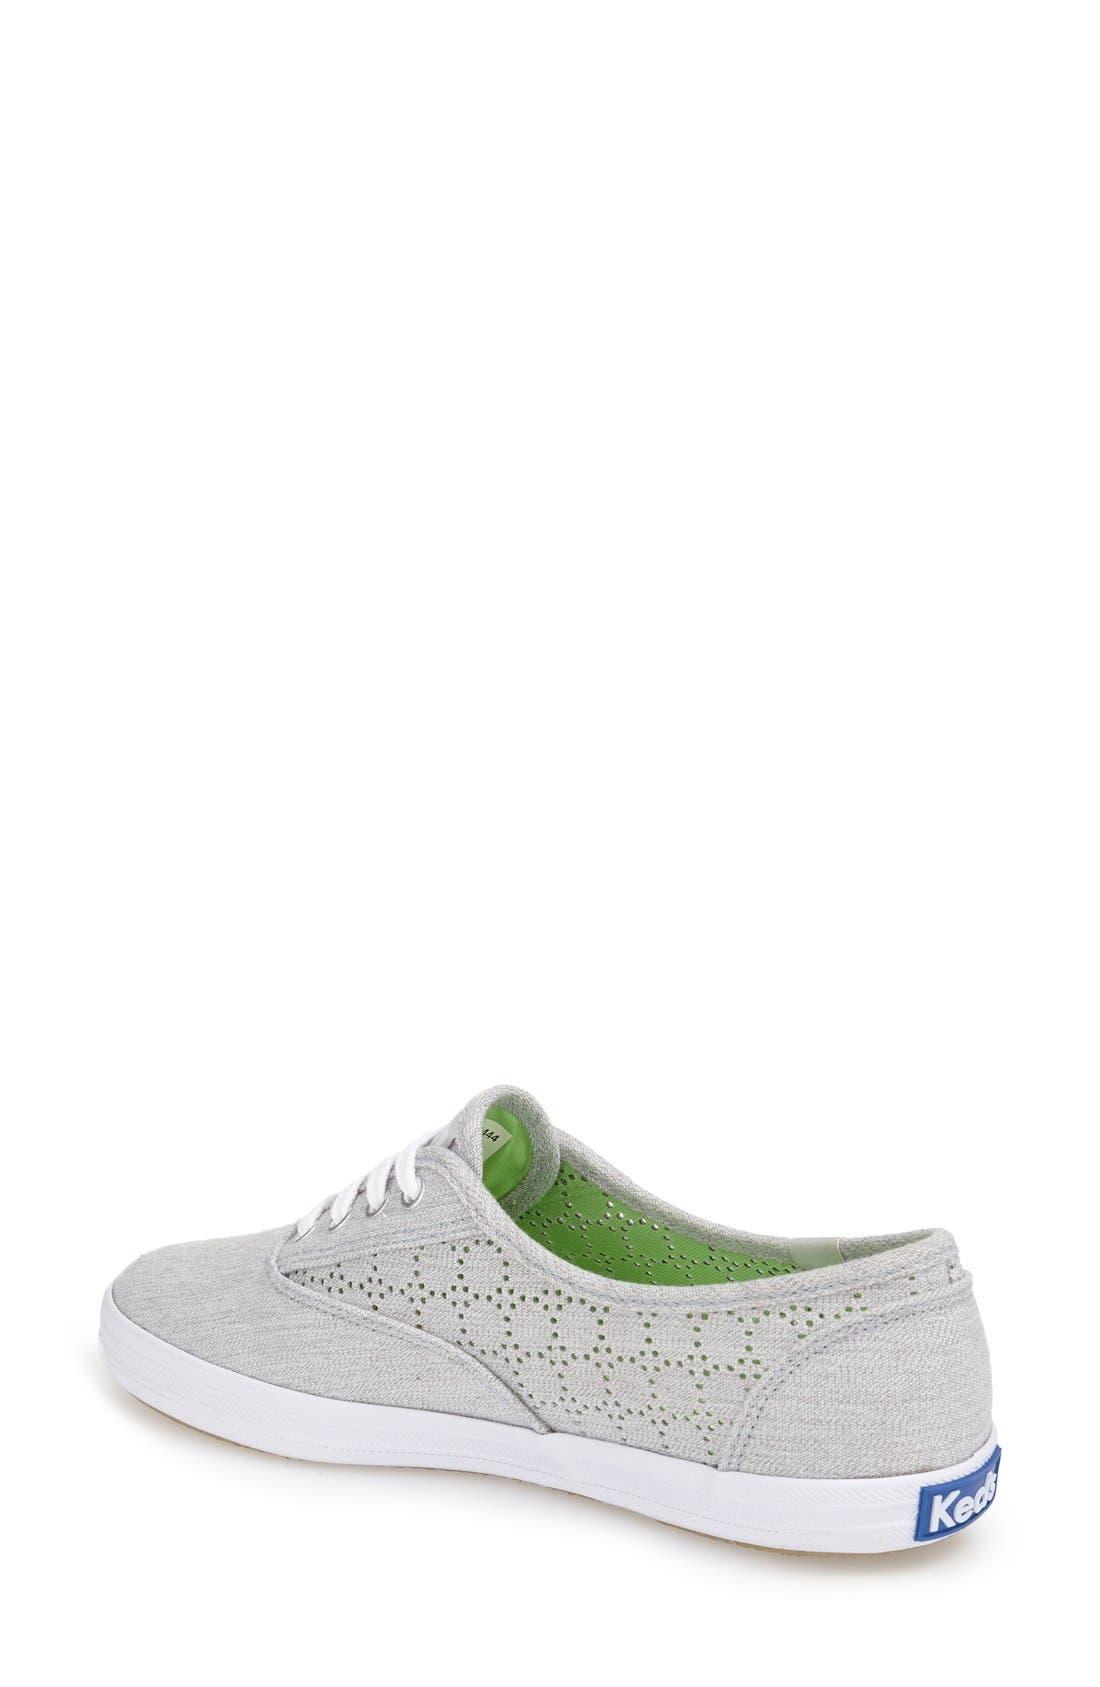 Alternate Image 2  - Keds® 'Champion' Perforated Sneaker (Women)